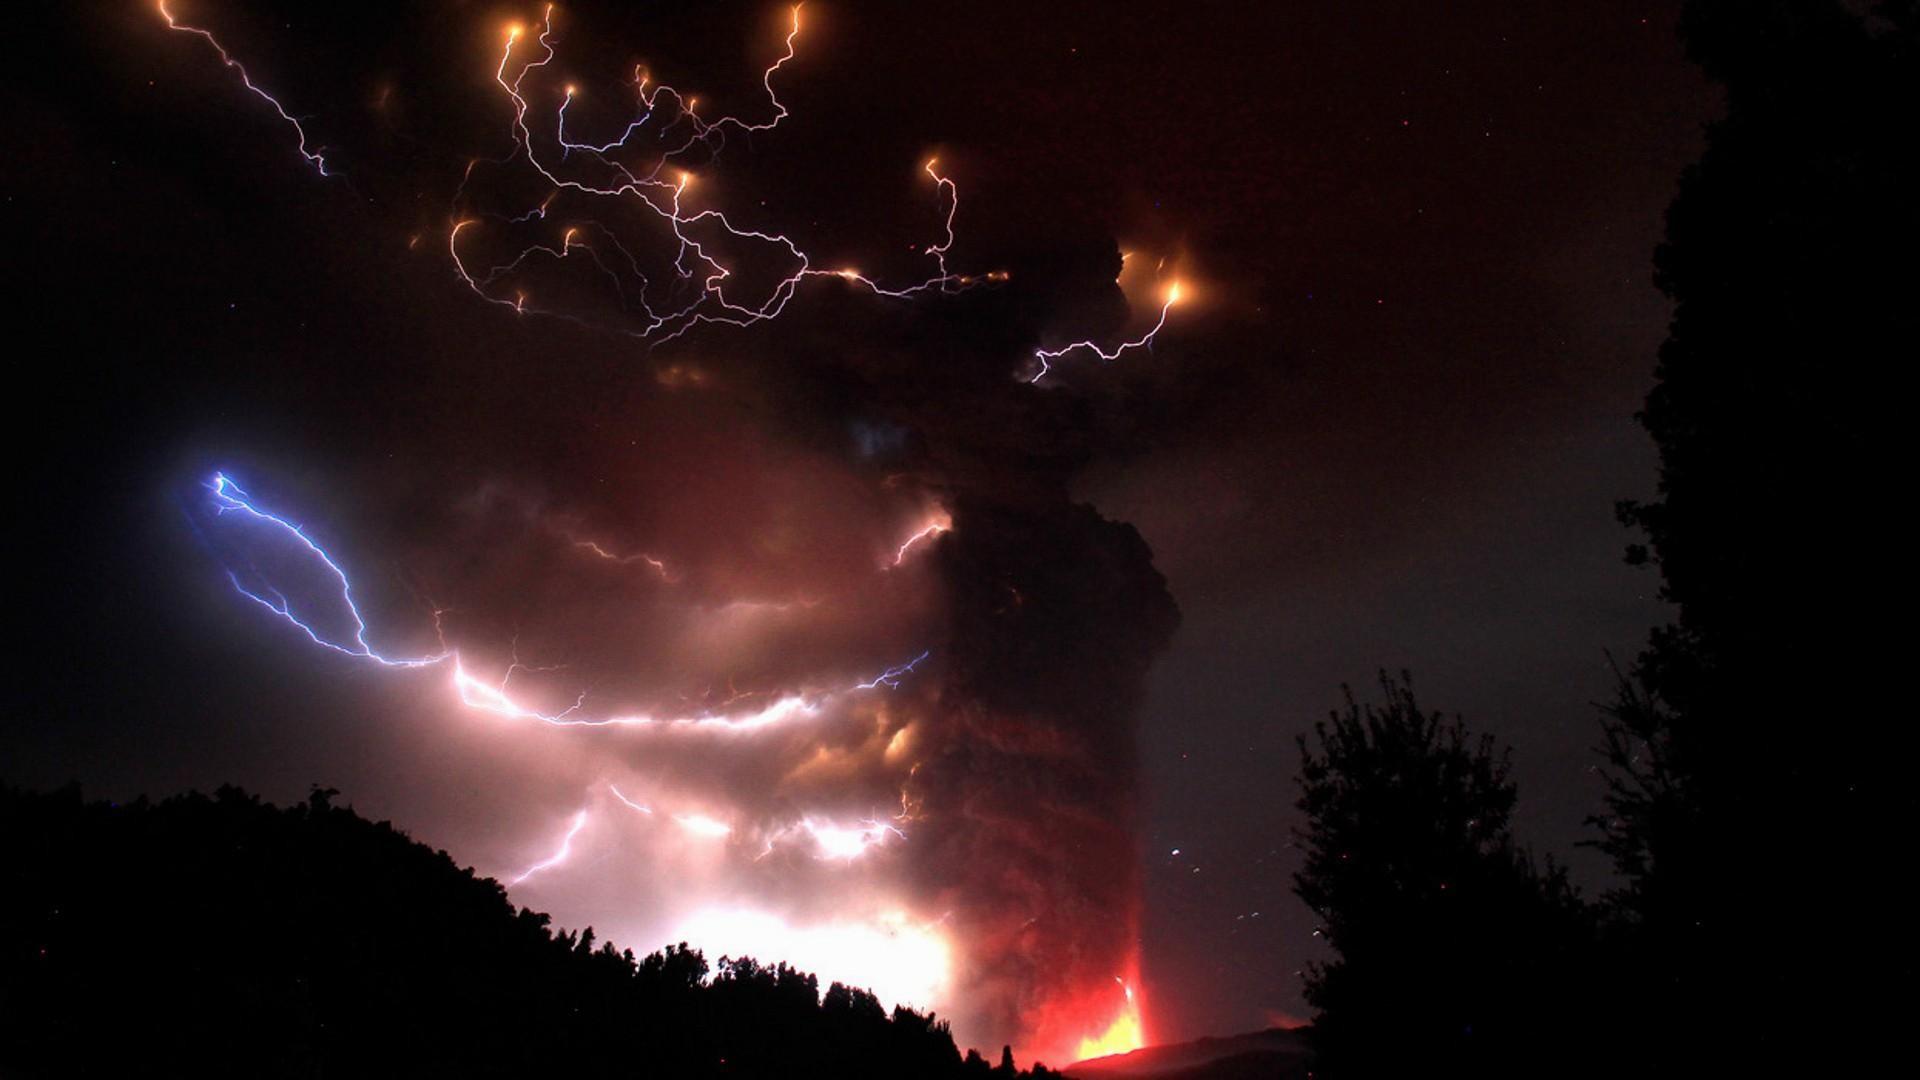 wallpaper.wiki-Lightning-Storm-Image-Full-HD-PIC-